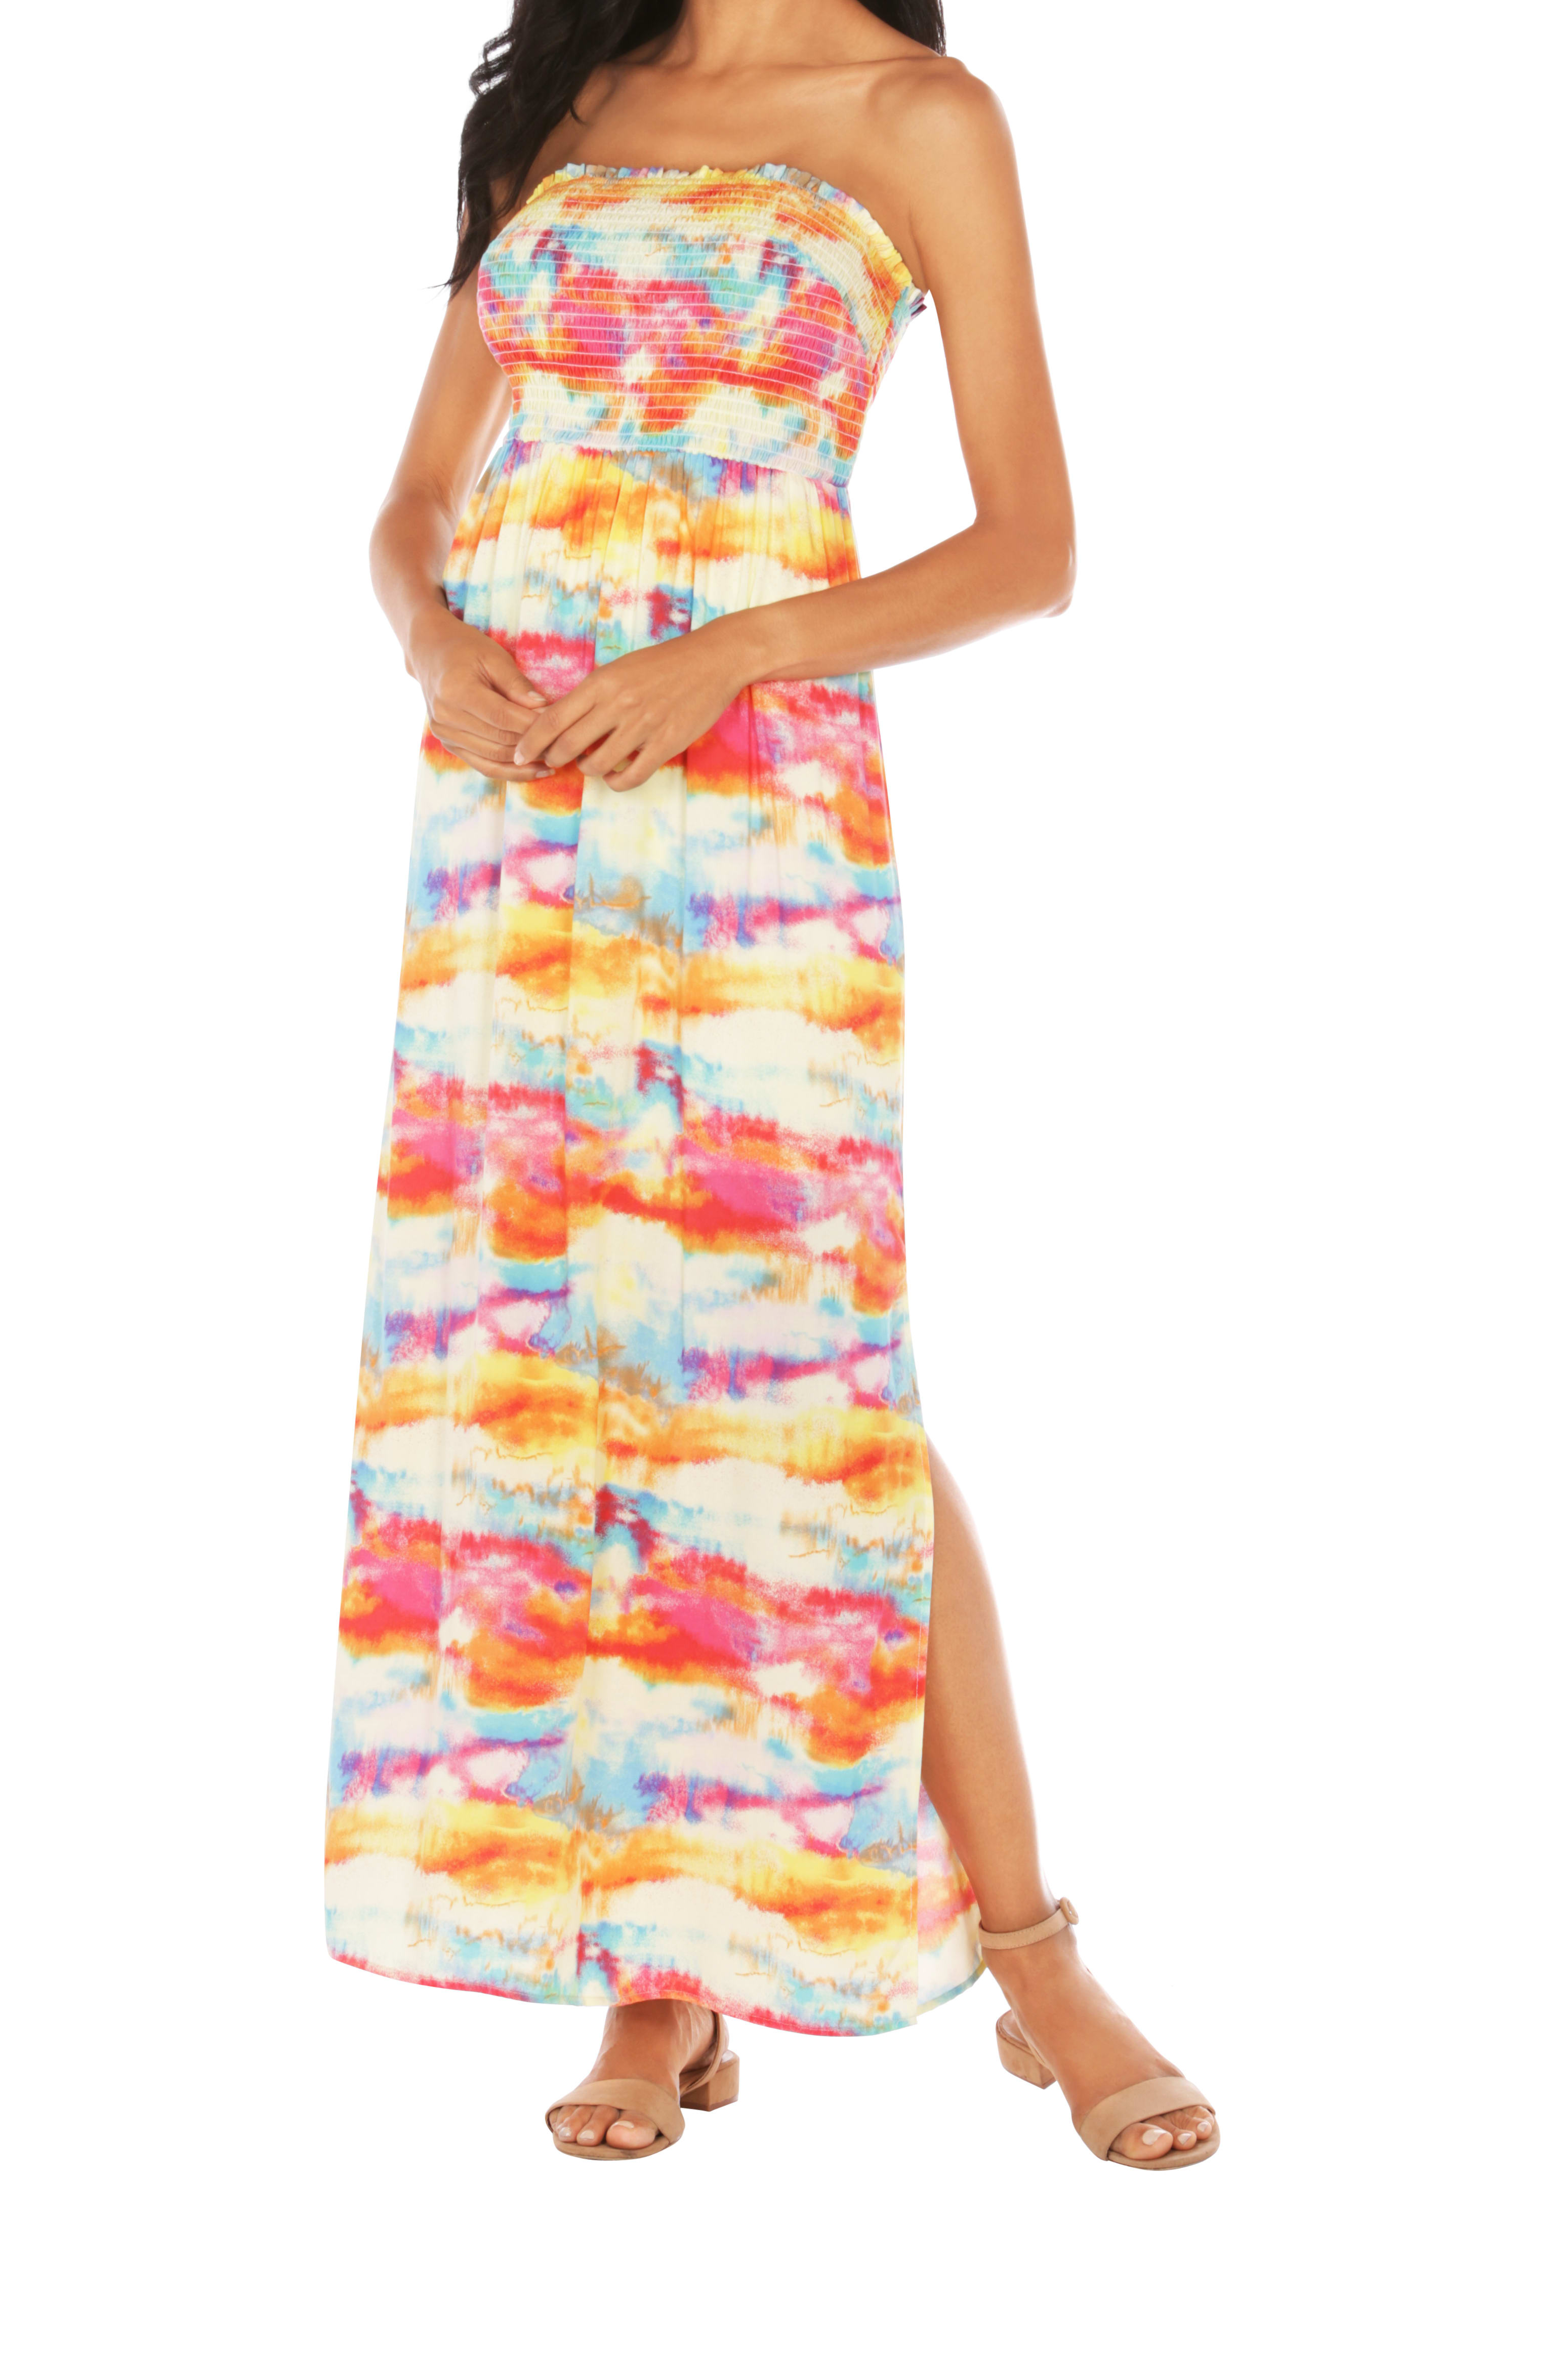 Caribbean Joe® Smocked Maxi Dress - Saffron - Front